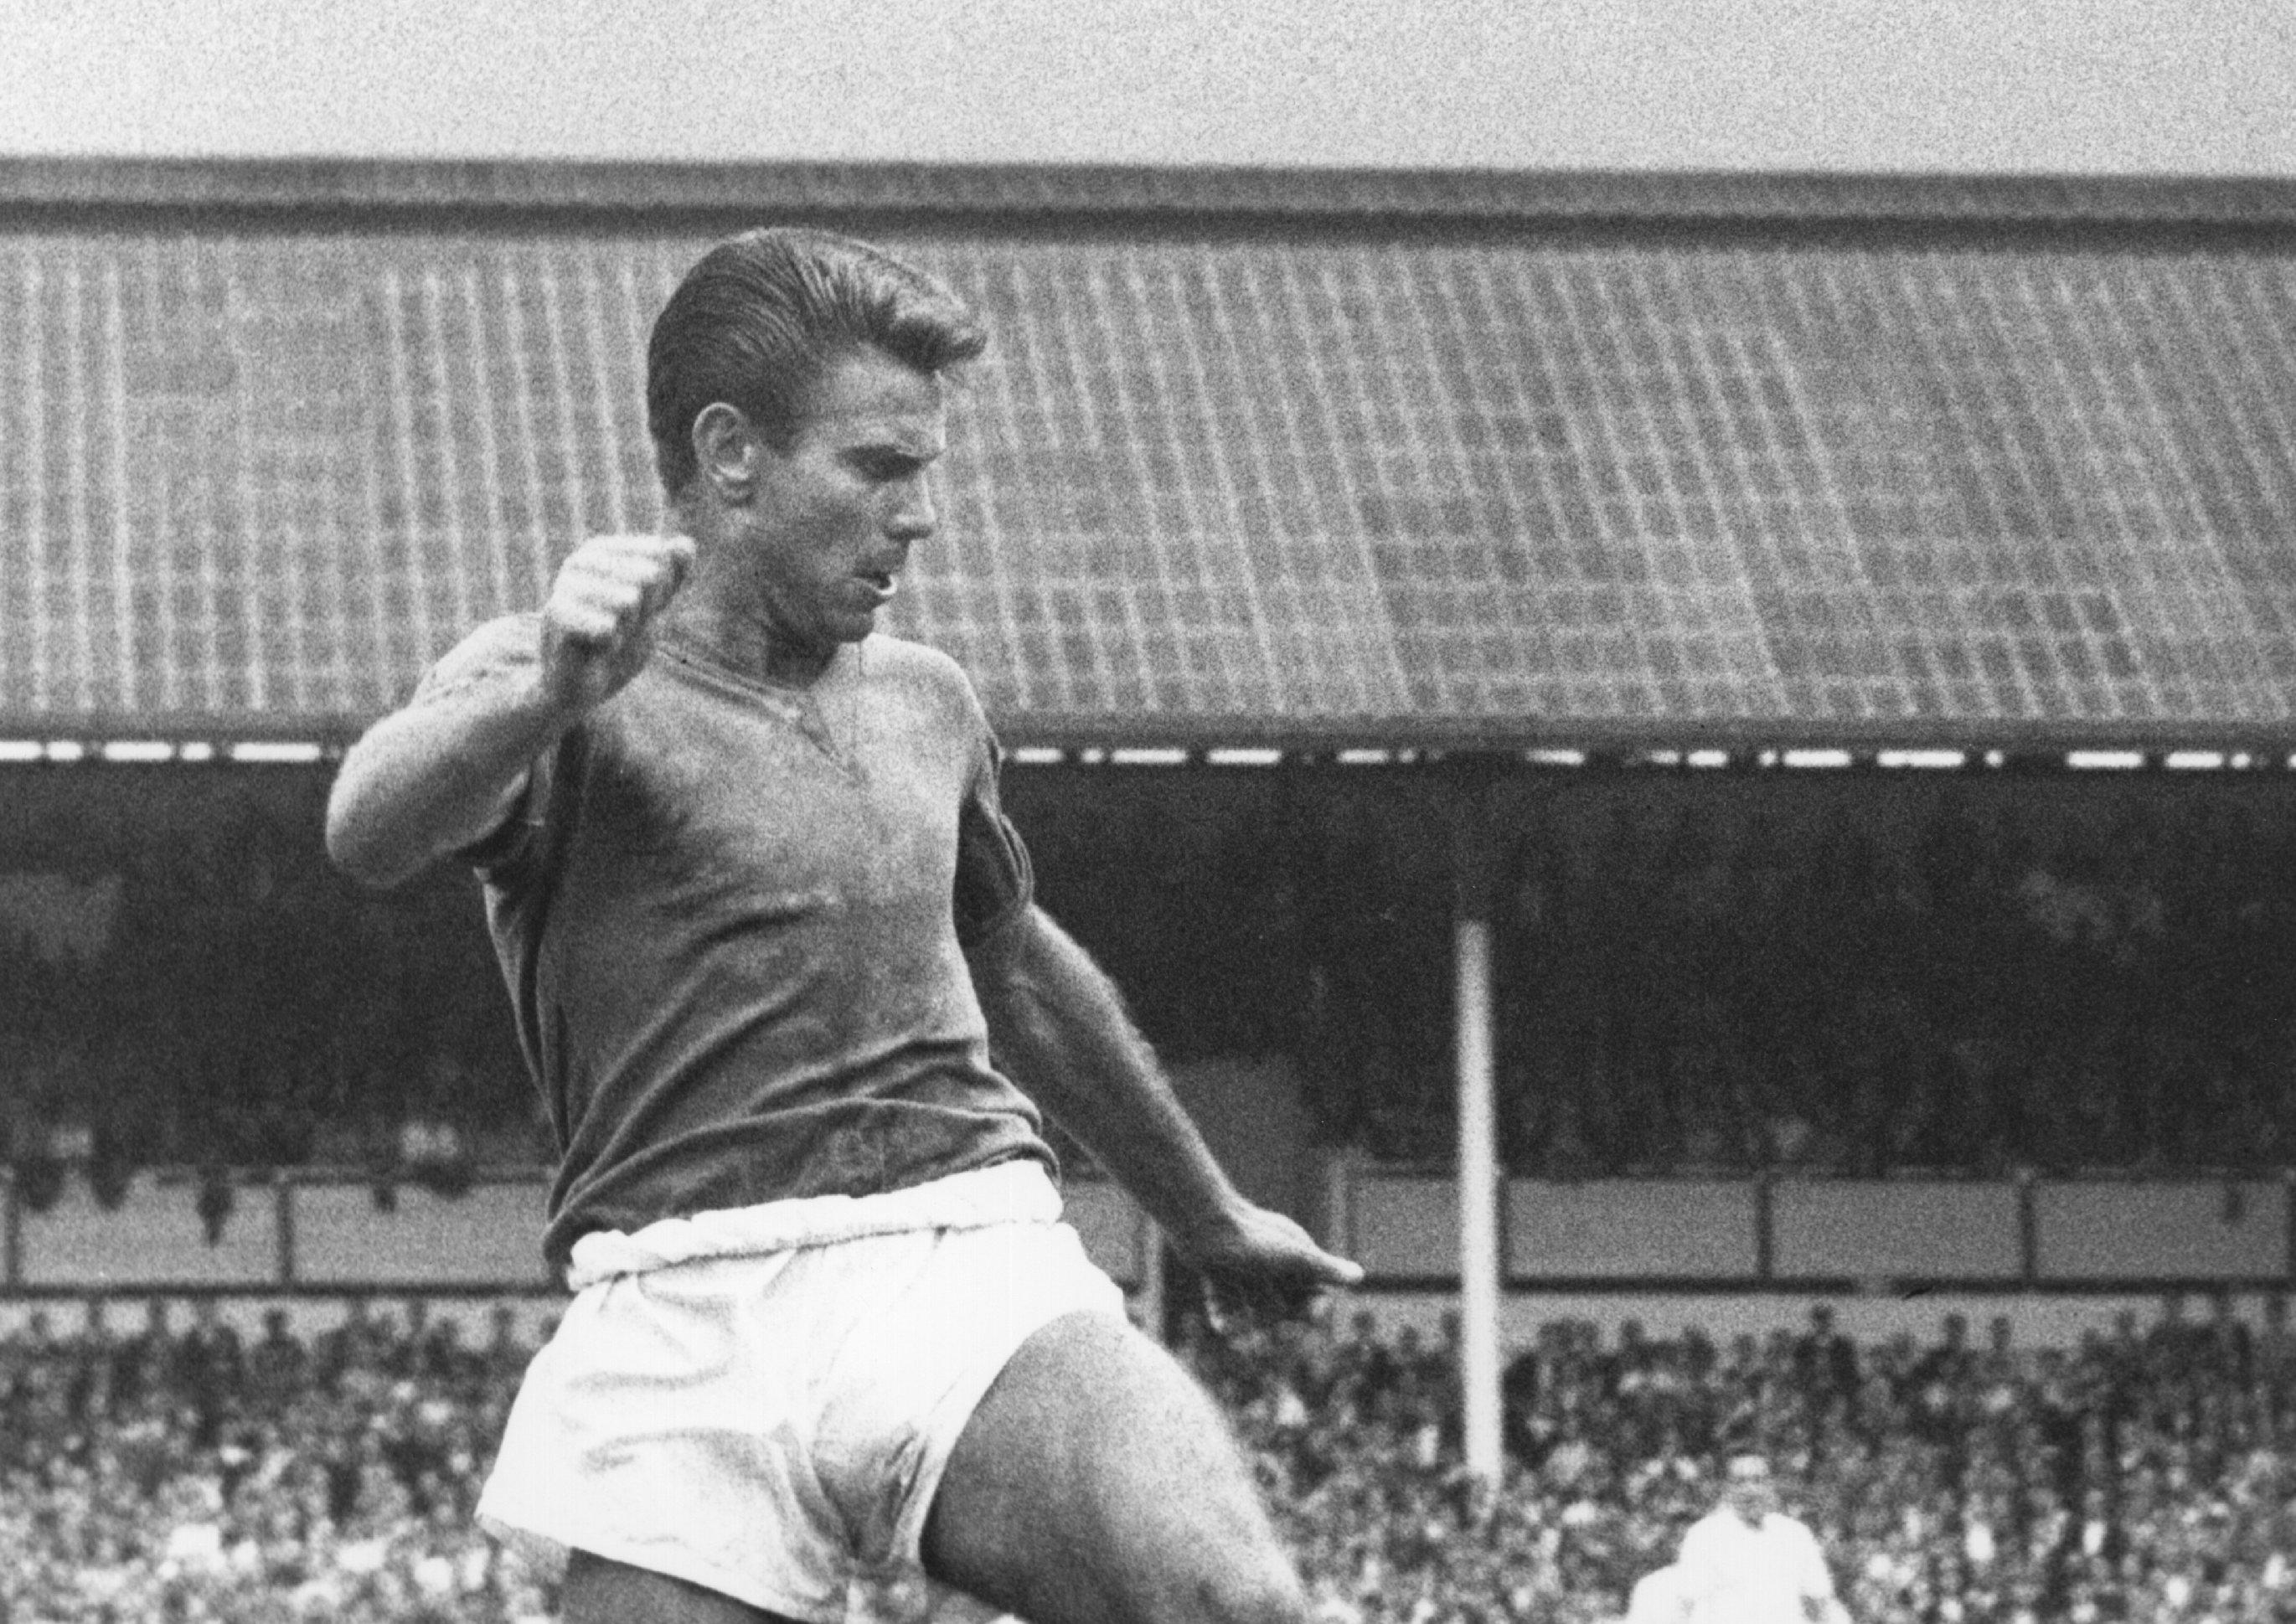 1964 british betting scandal football field bet on blast freestyle friday